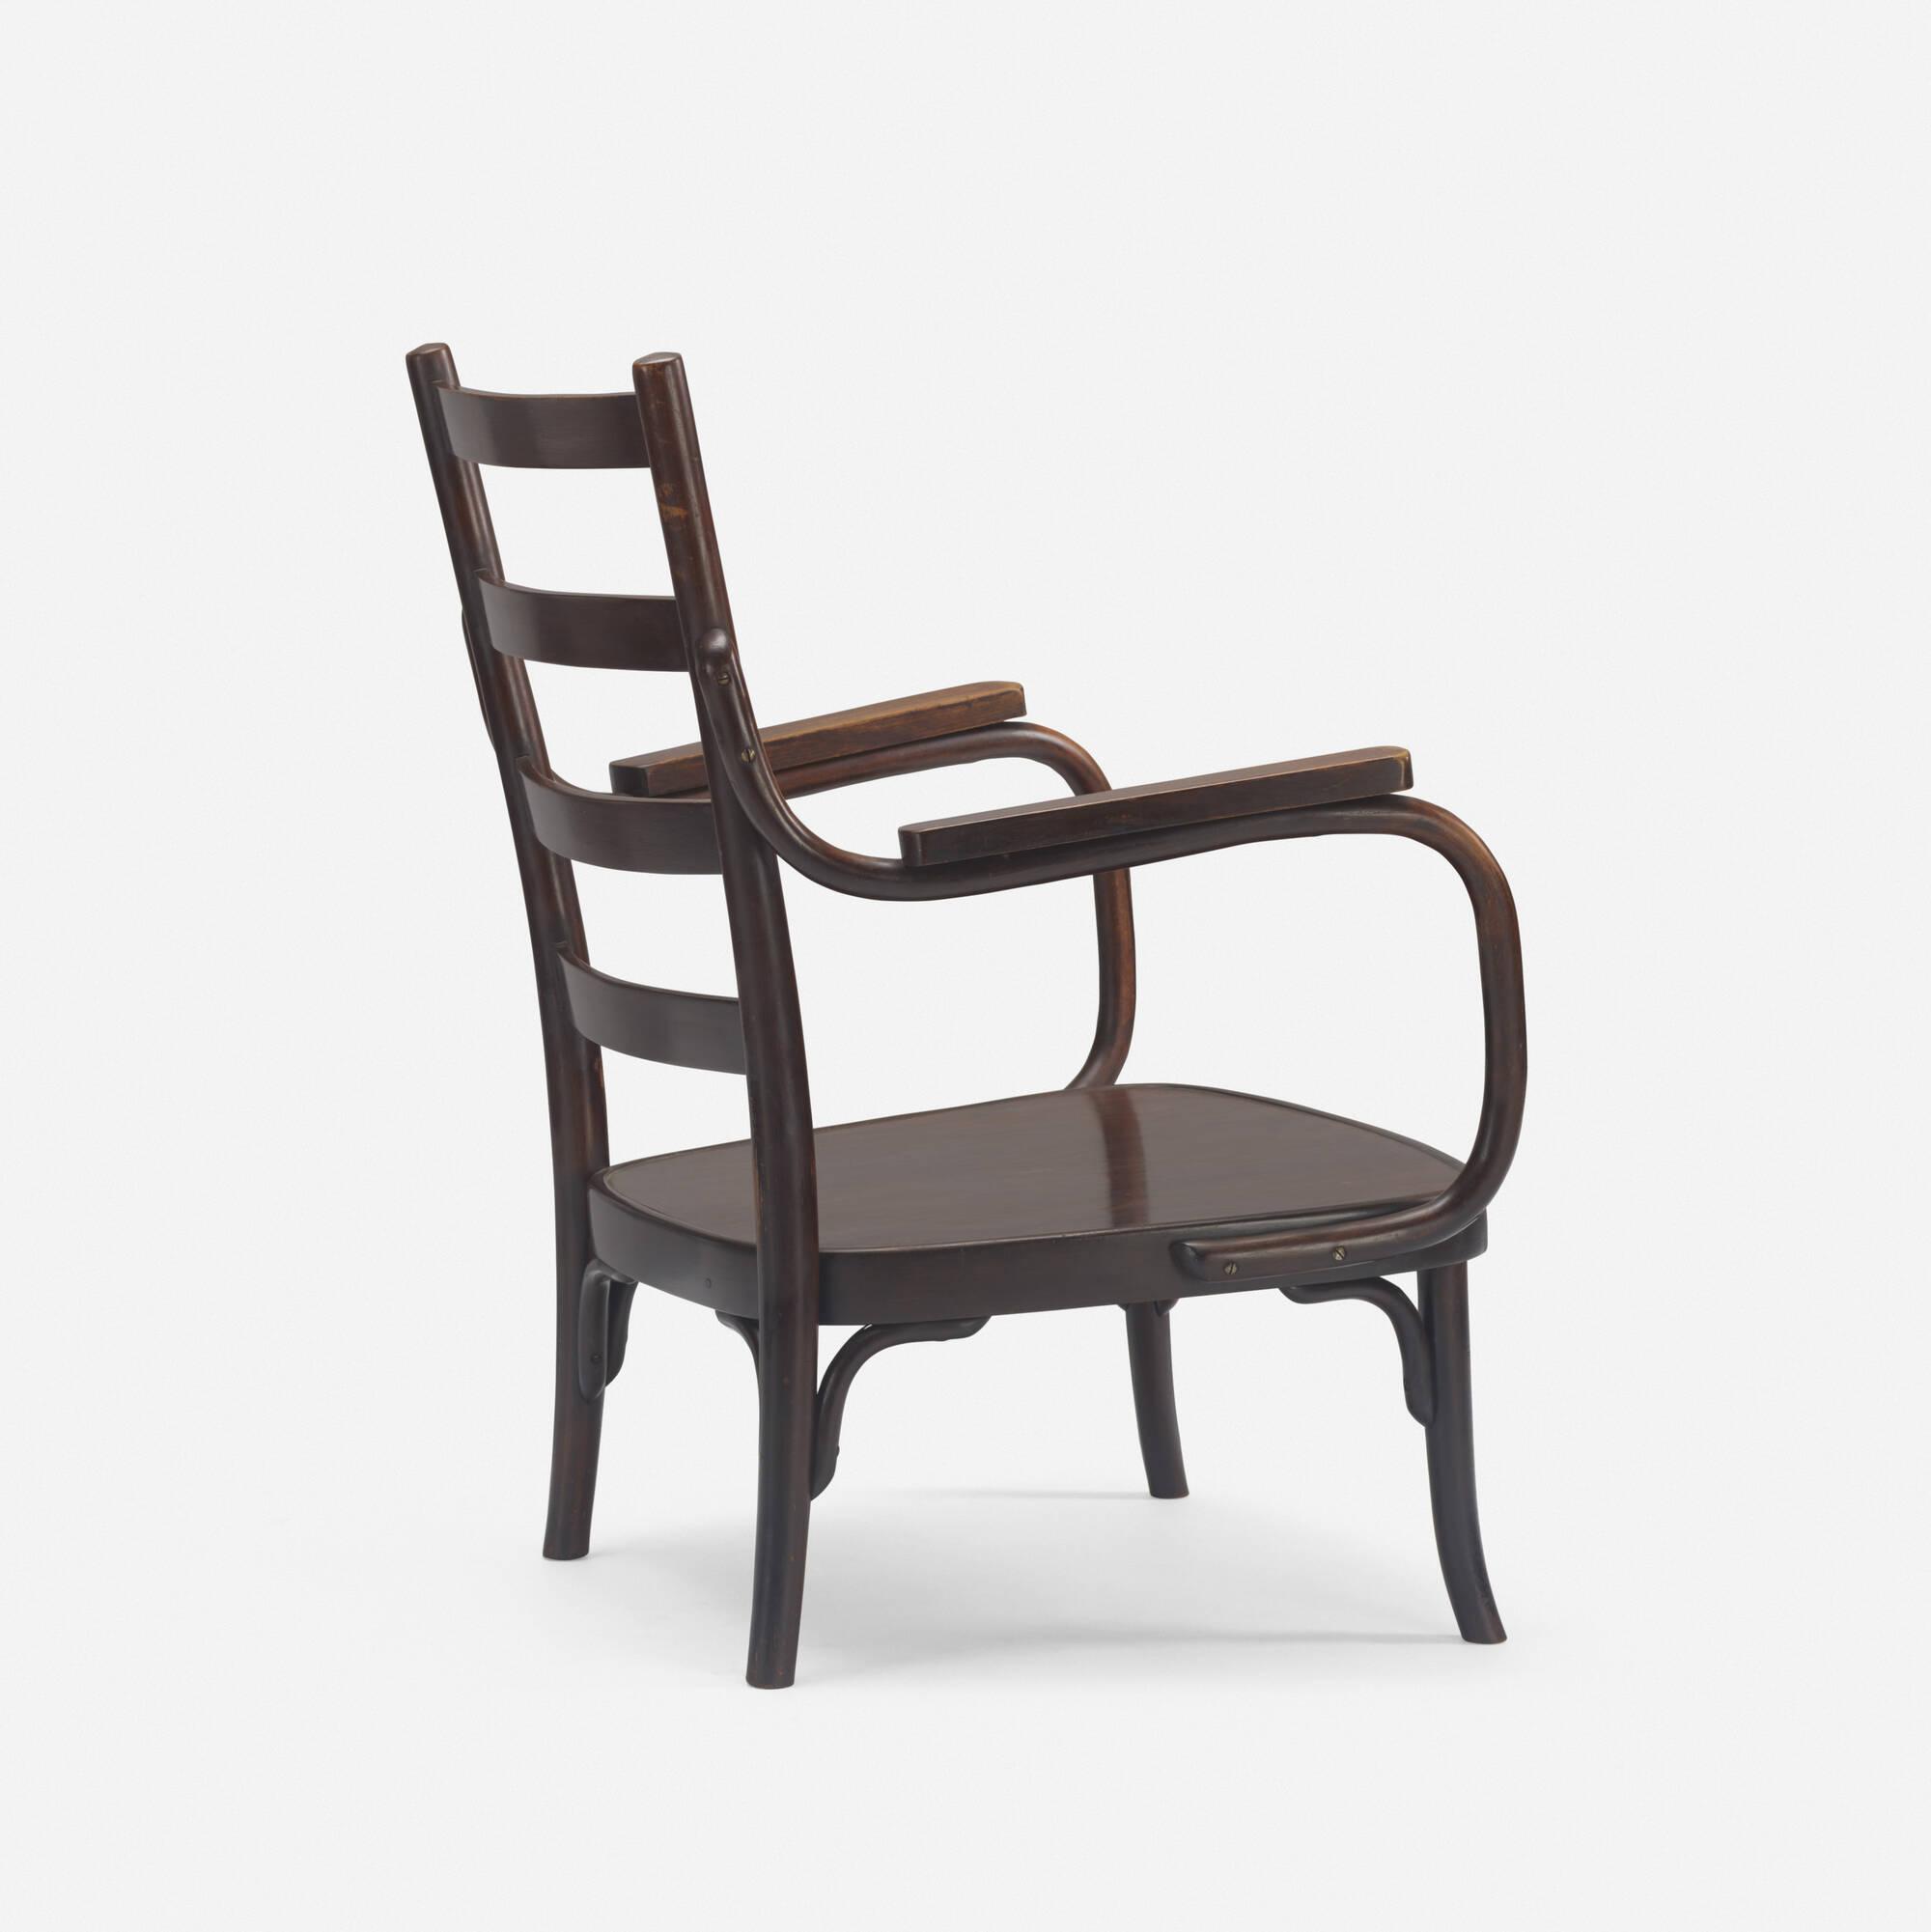 241: Josef Frank / armchair, model A403F (3 of 5)